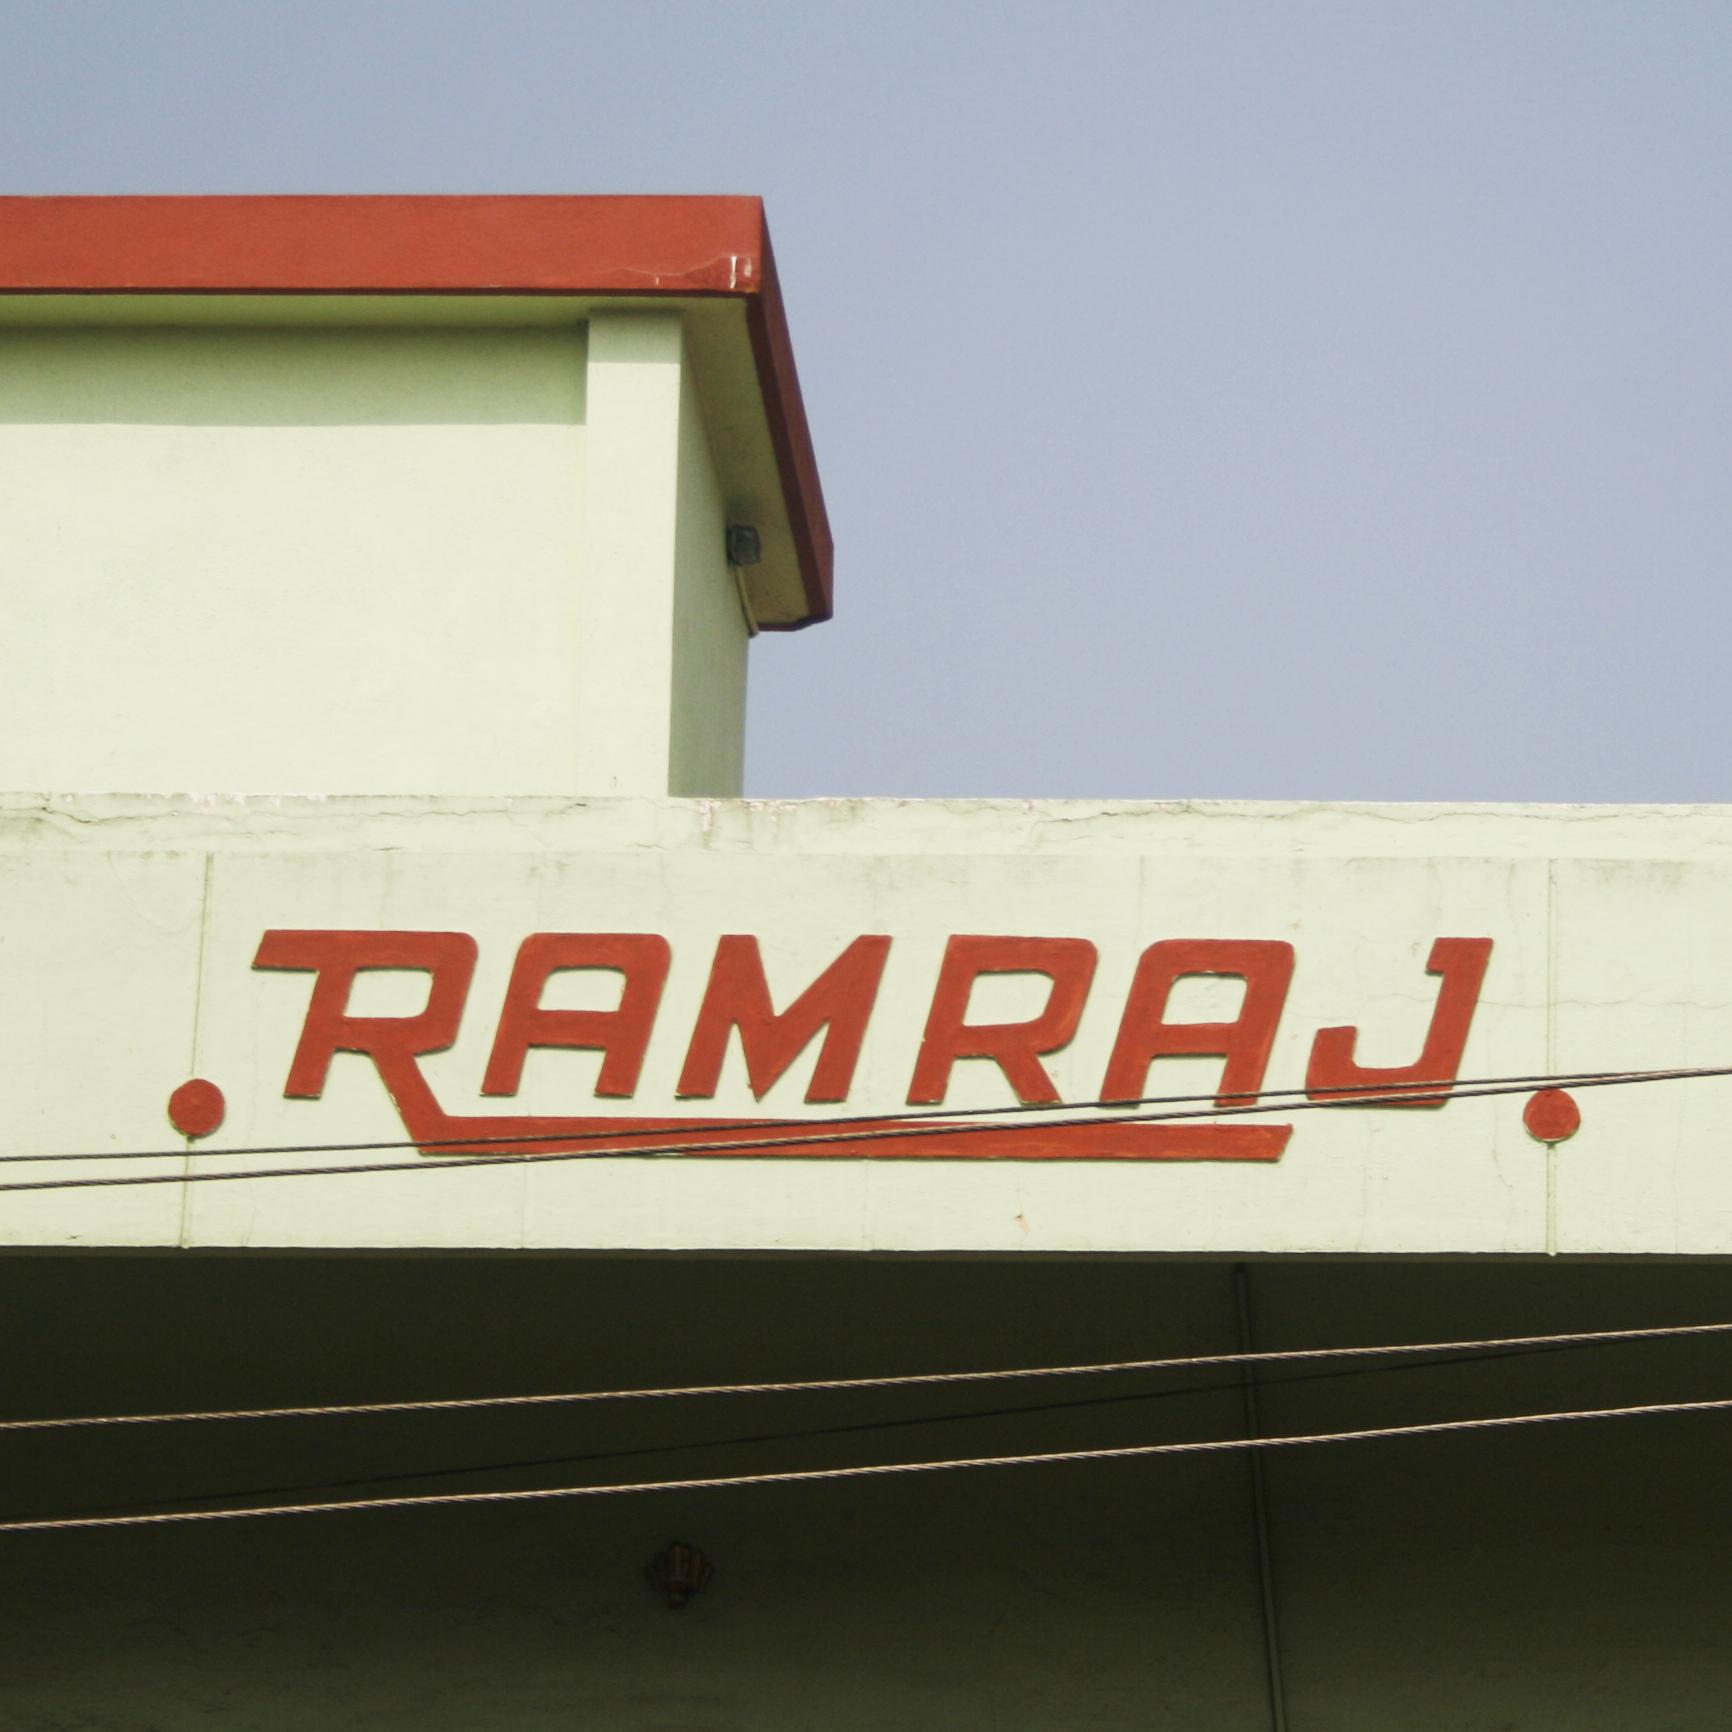 Ramraj